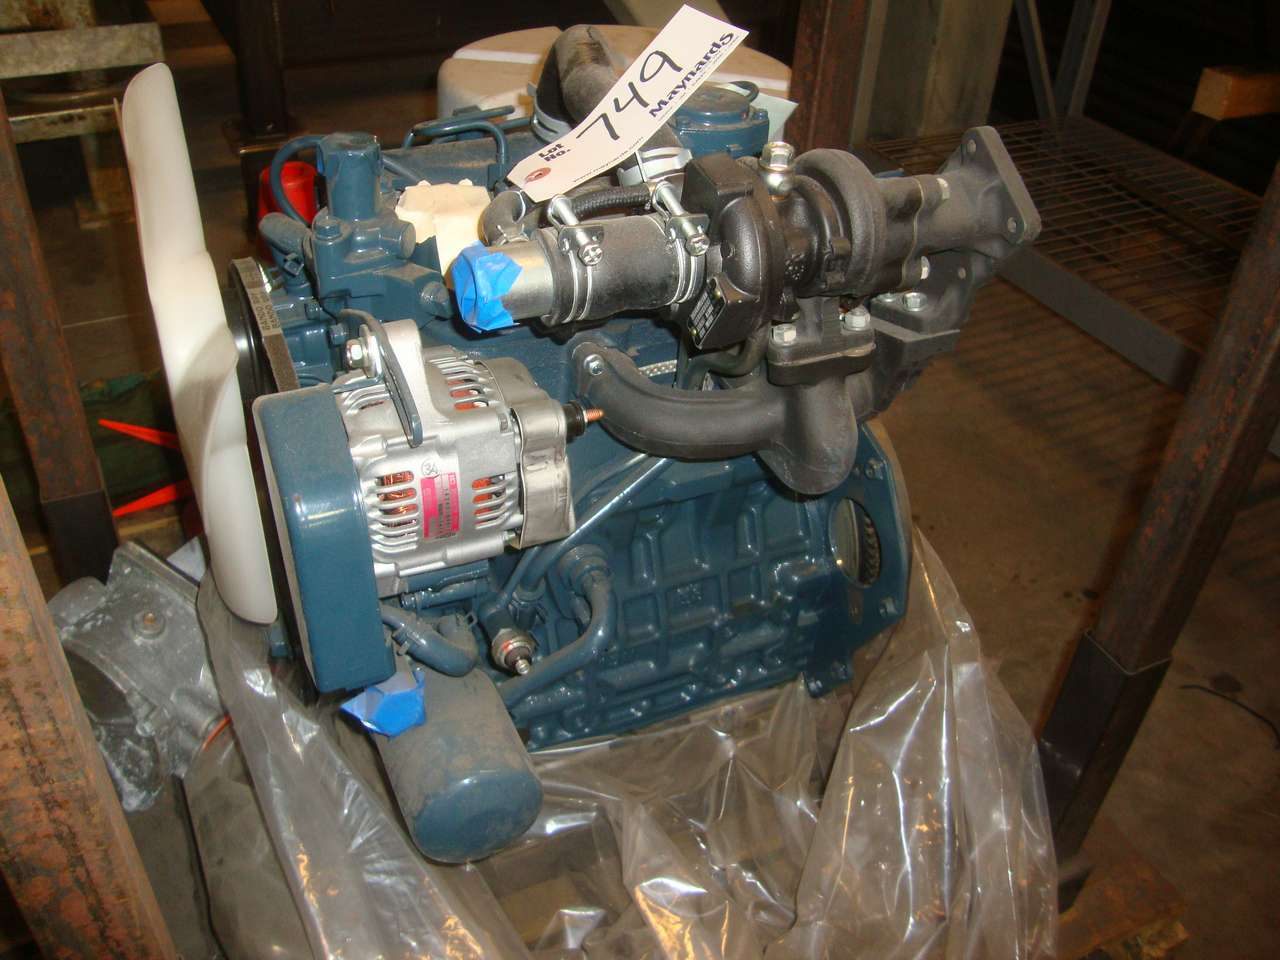 Kubota D1105-T 24 5kW Diesel engine (new)